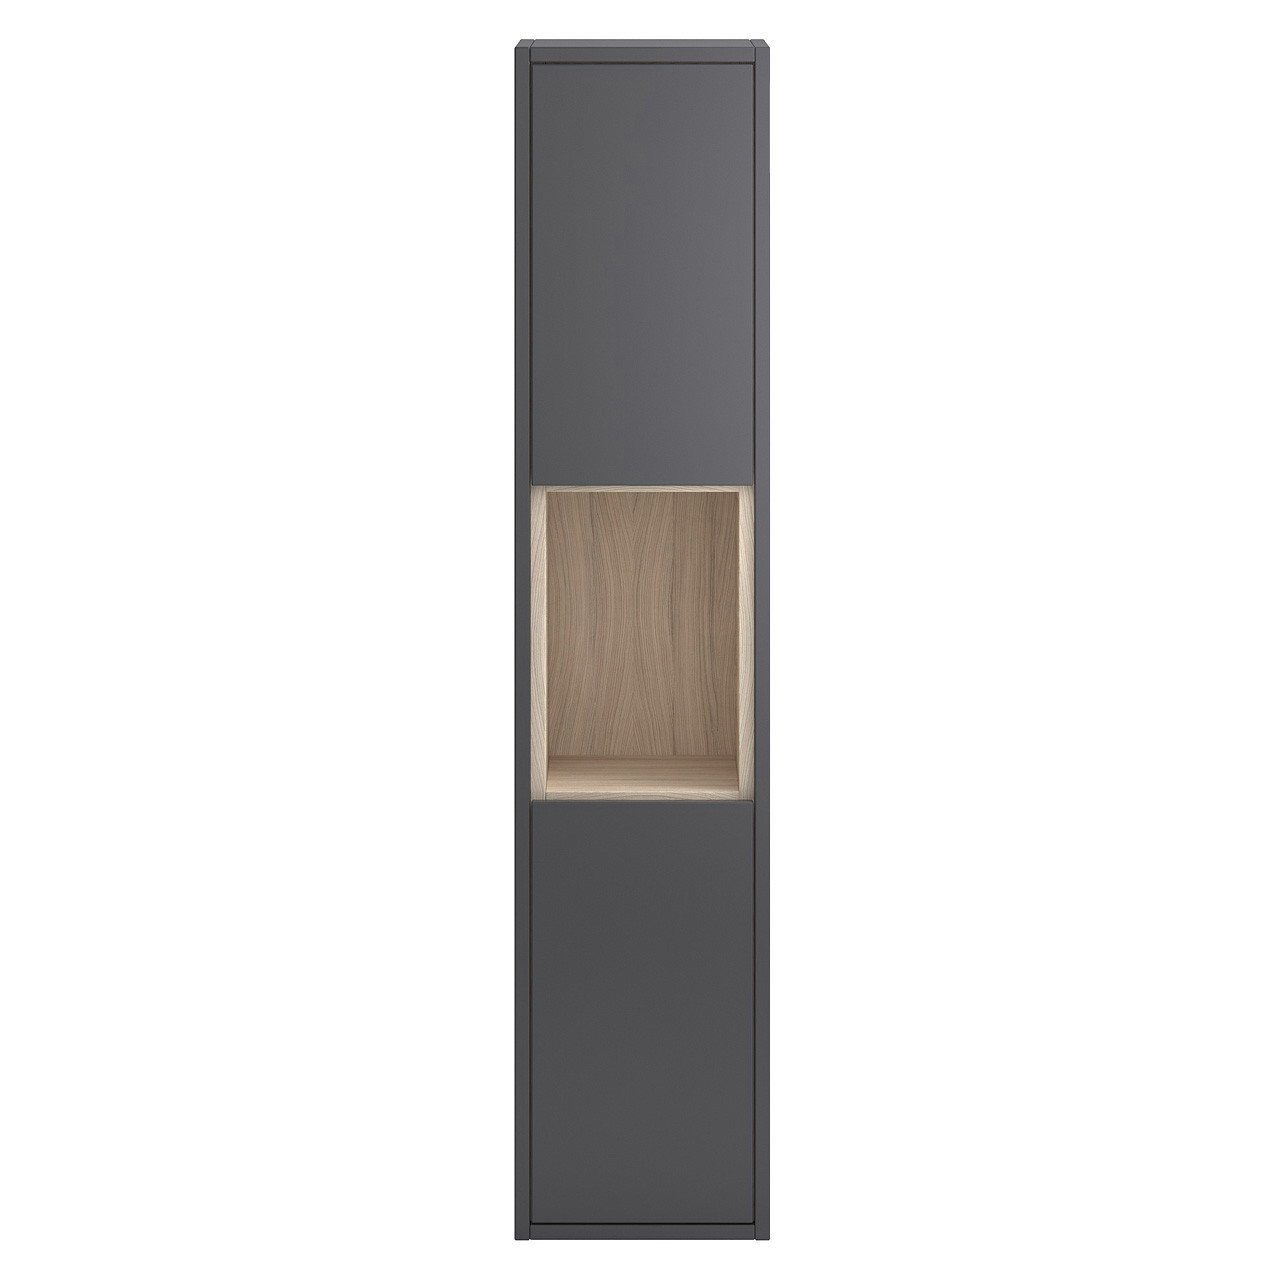 https://www.mepstock.co.uk/admin/images/hudson-reed_grey-Tall-Unit-350mm_cabinet_wall-hung-FMC861.jpg